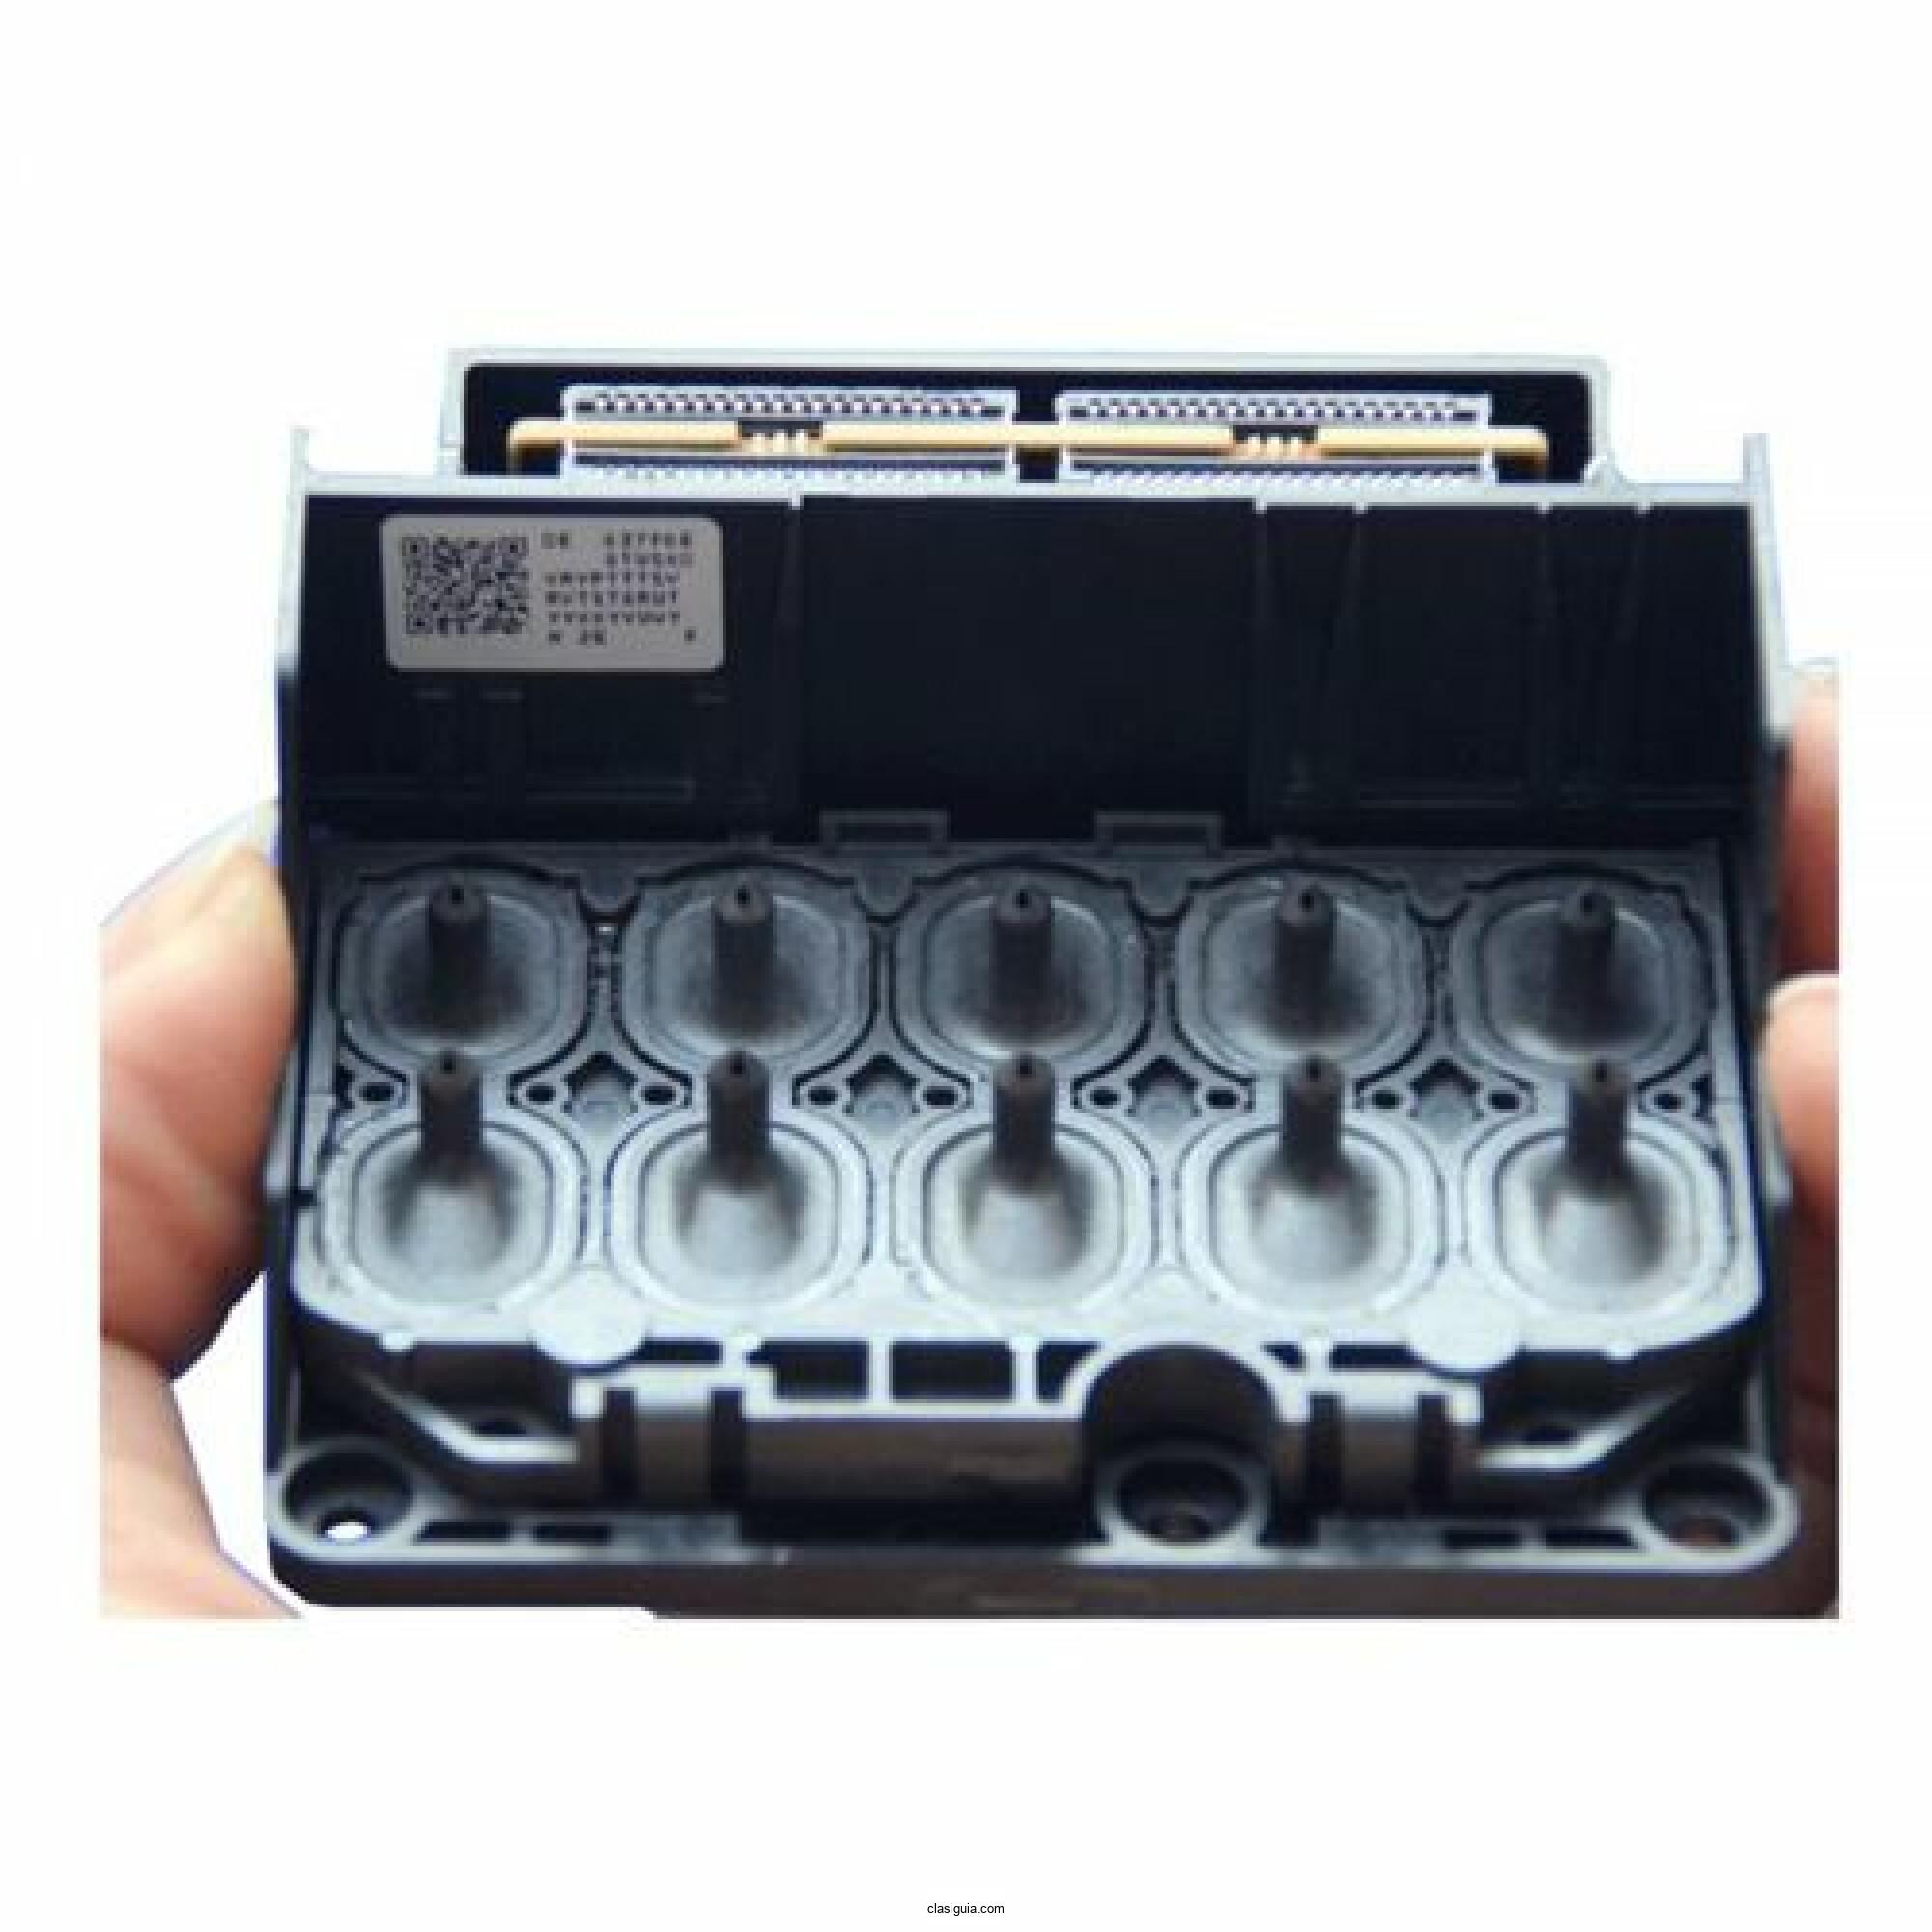 Epson PRO 11880C Printhead- F179000 / F179010 / F179030 (INDOELECTRONIC)